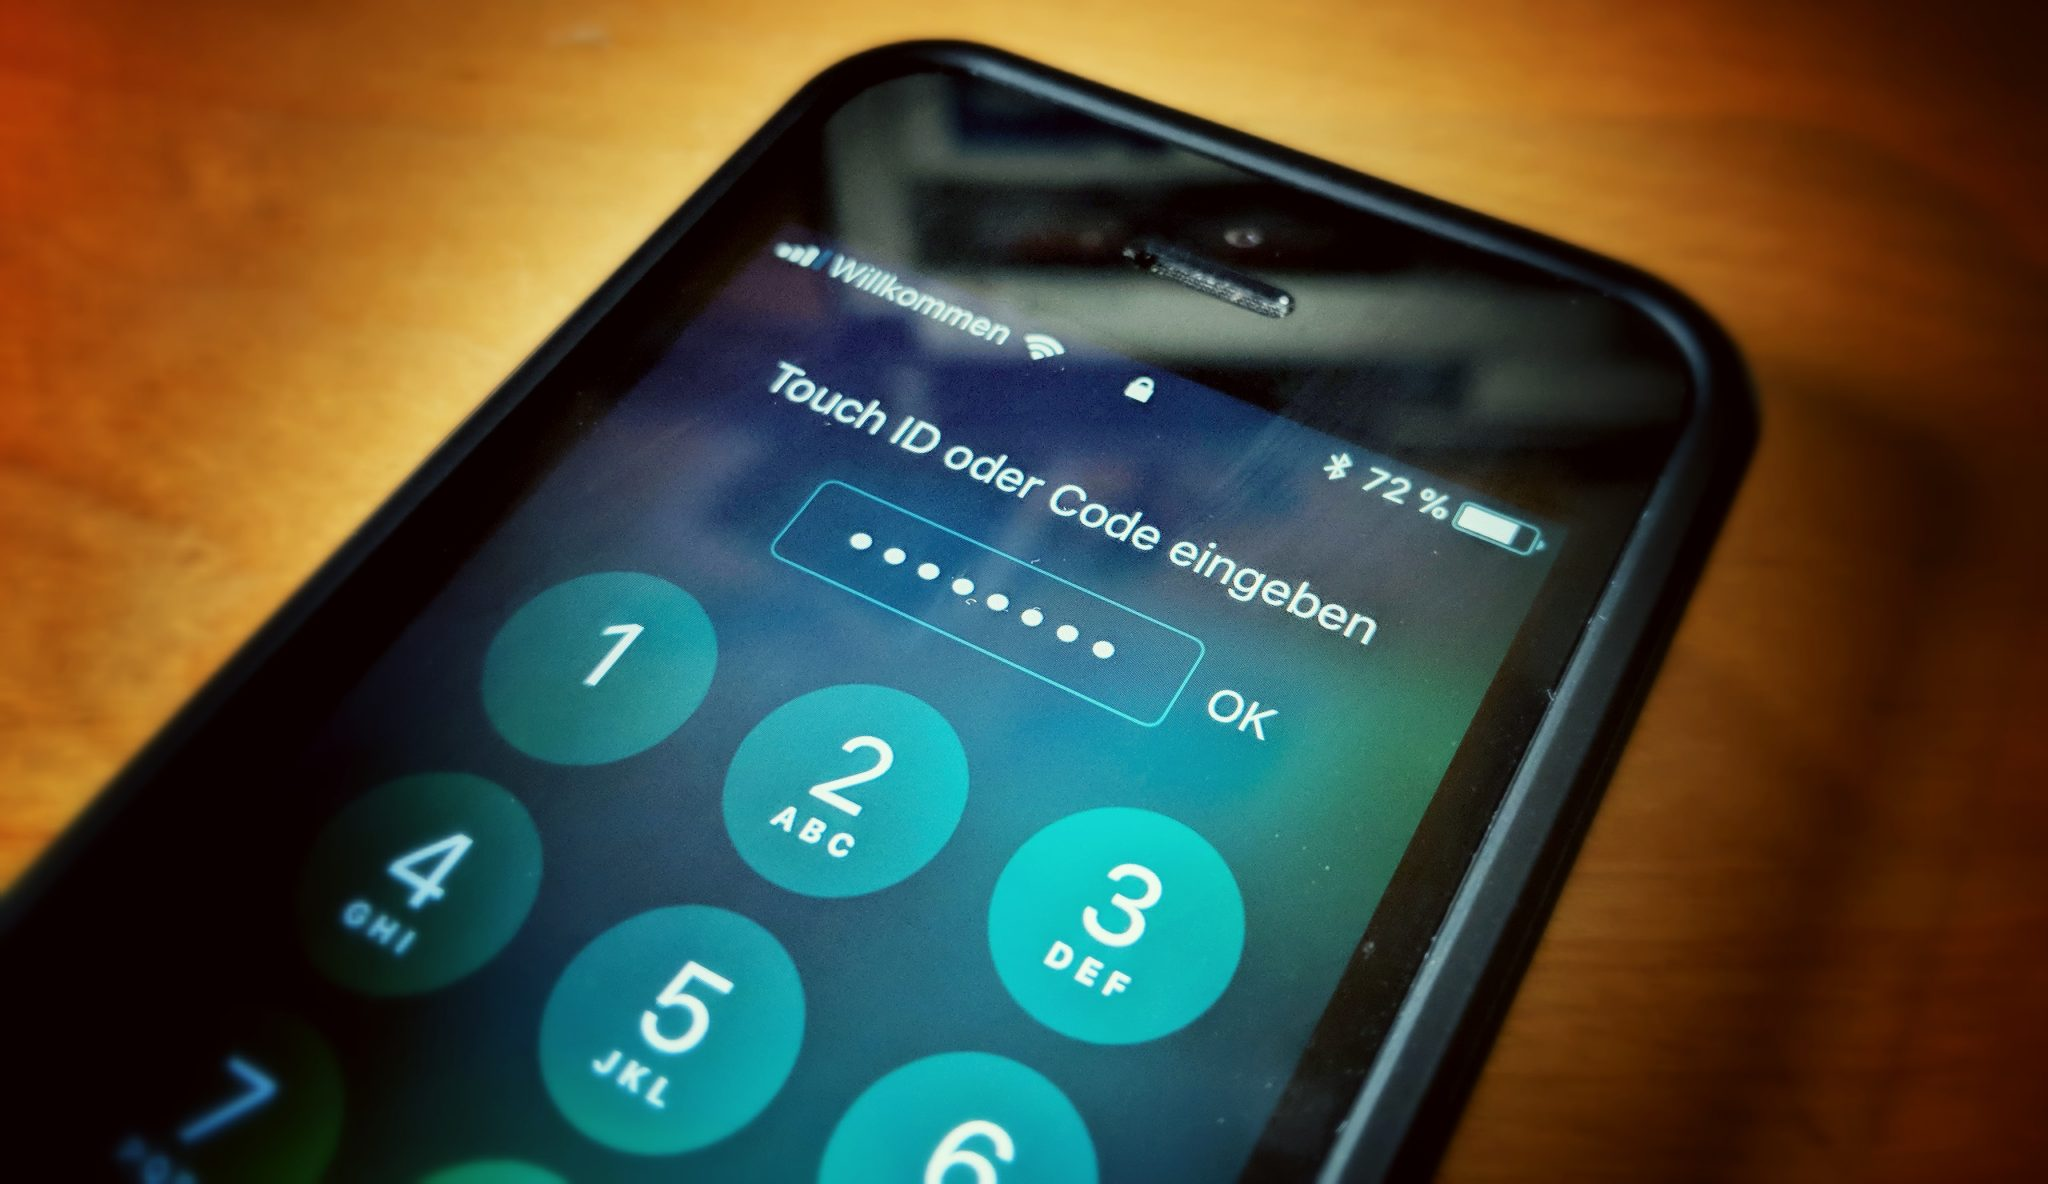 iphone und ipad mit l ngerem code oder passwort entsperren der tutonaut. Black Bedroom Furniture Sets. Home Design Ideas